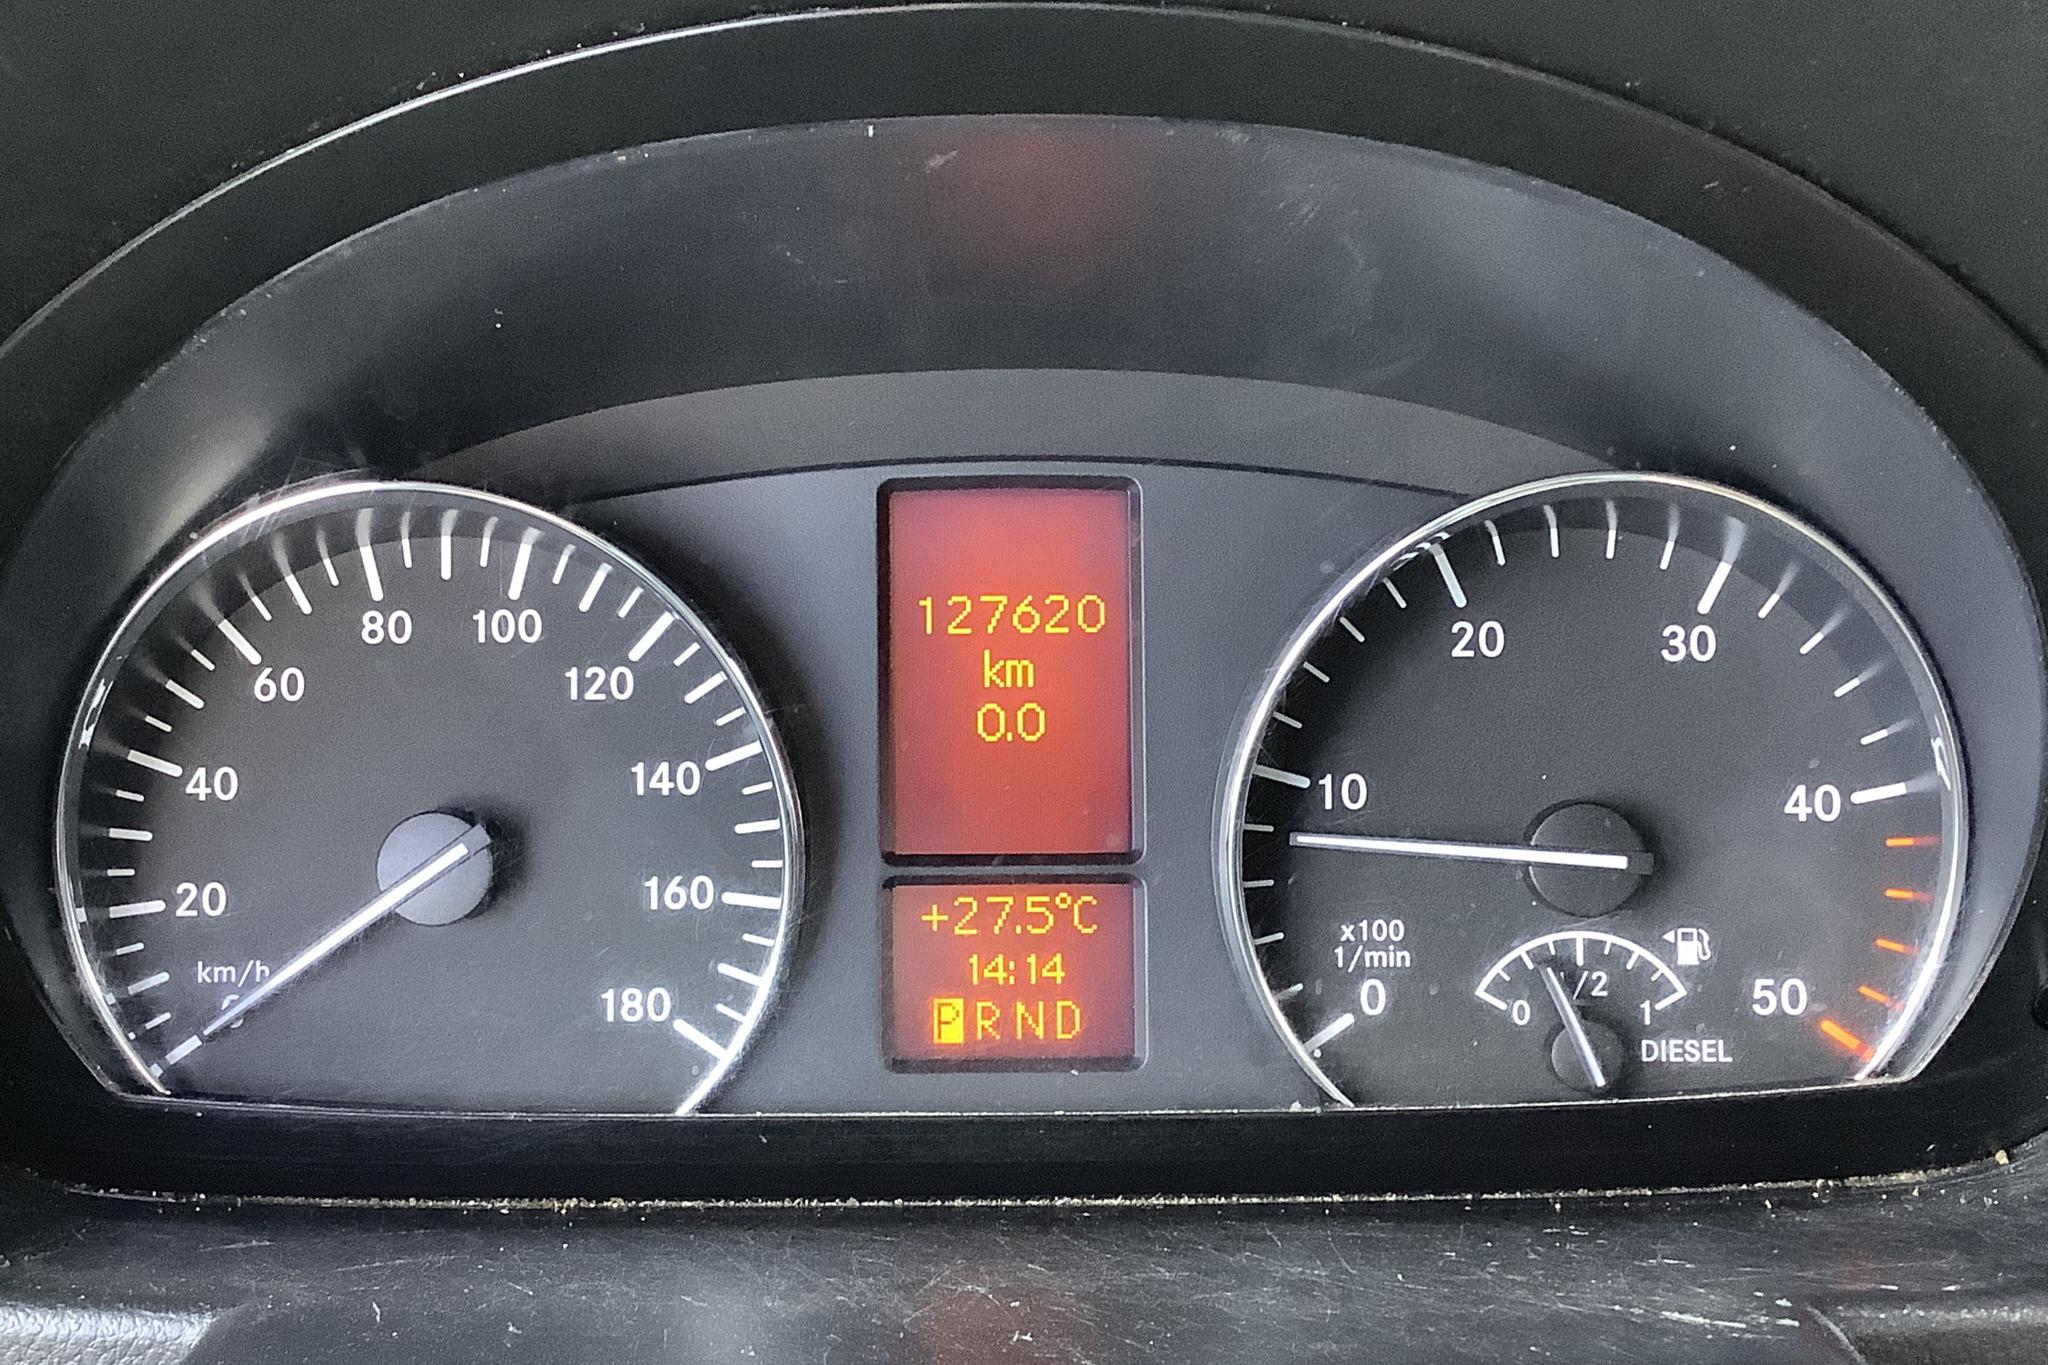 Mercedes Sprinter 316 CDI (163hk) - 127 620 km - Automatic - white - 2017